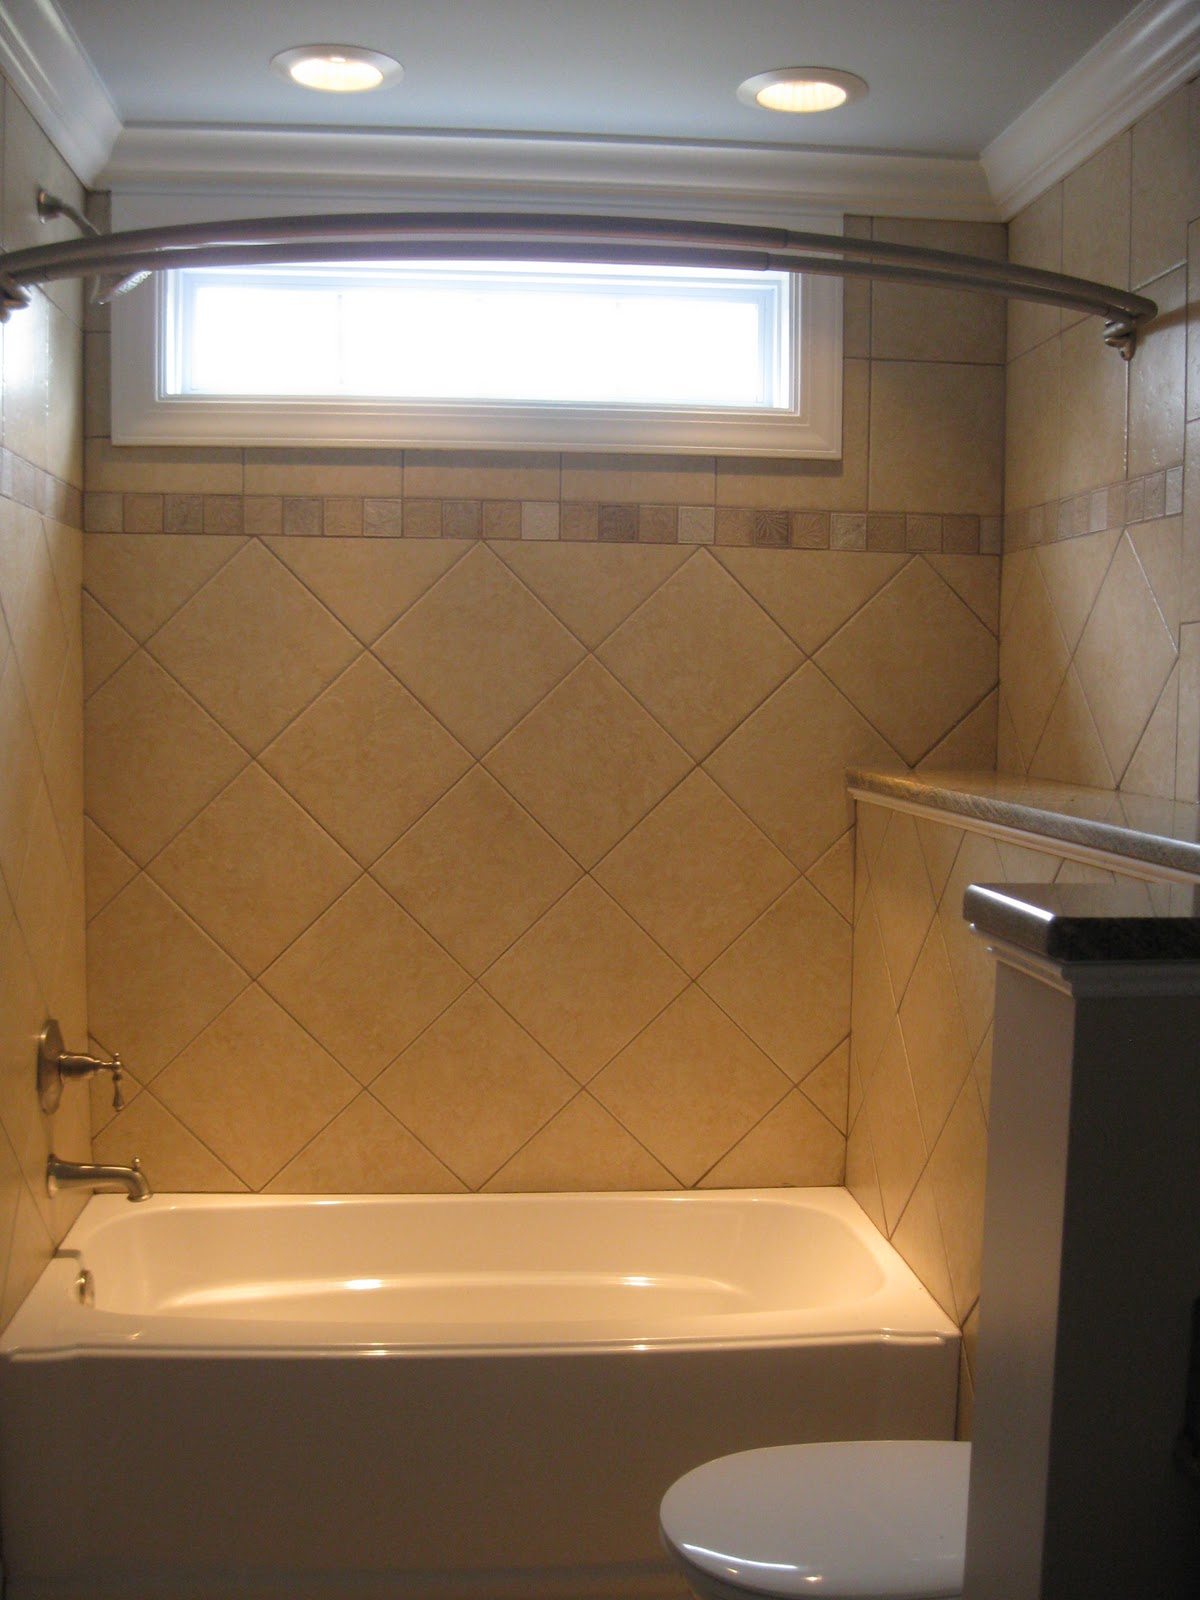 SMALL BATHROOM REDESIGN BATHROOM DESIGN